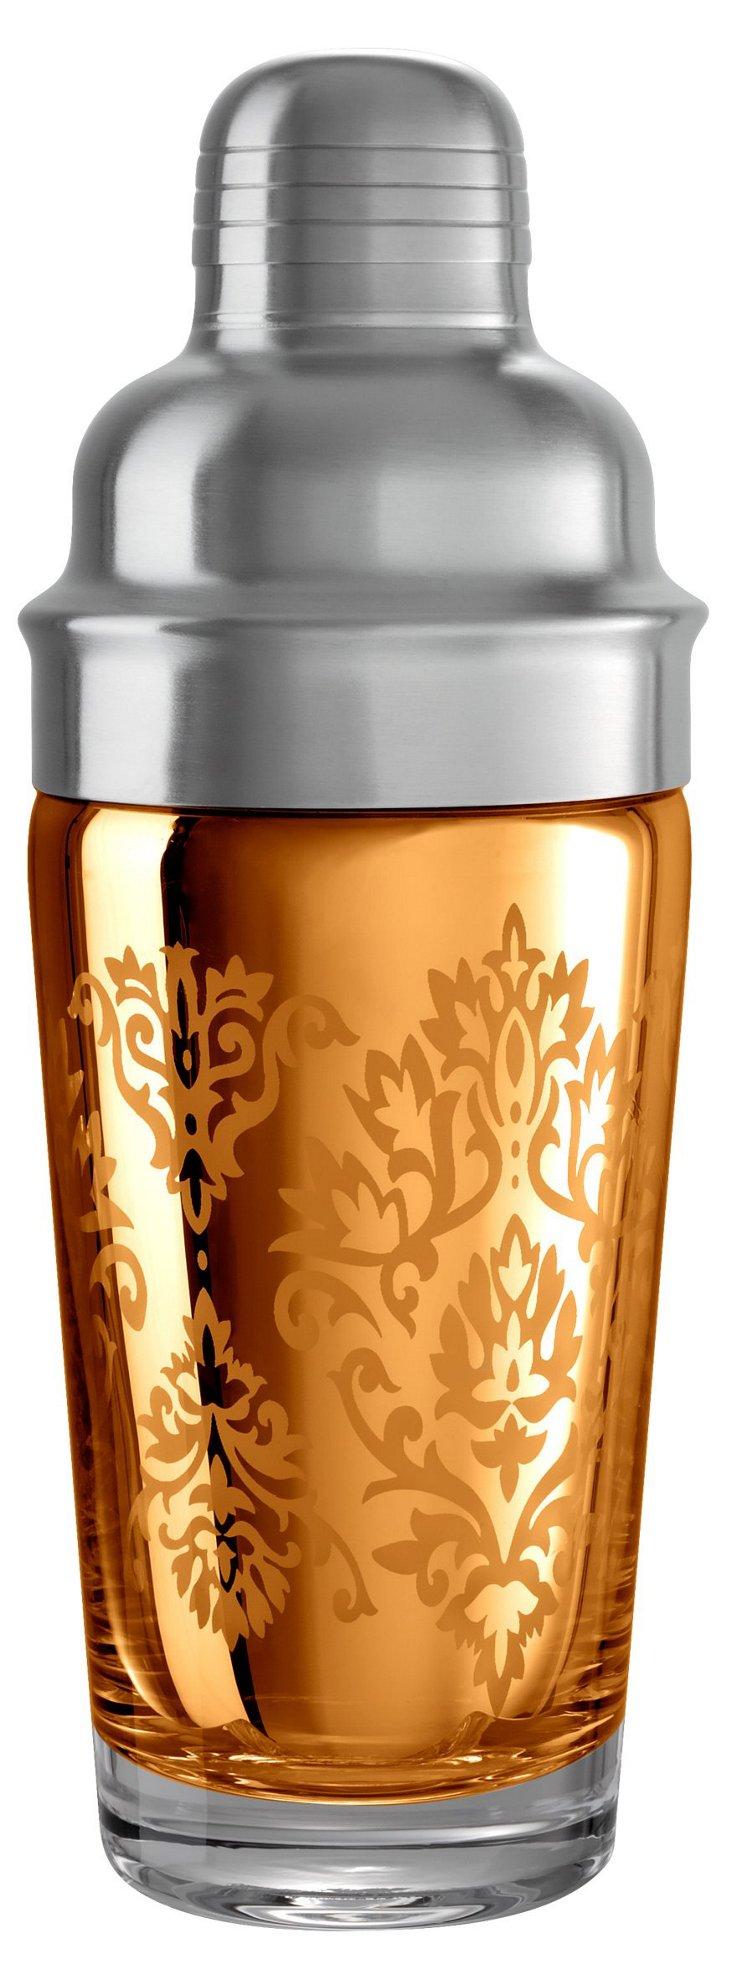 Brocade Cocktail Shaker, Gold